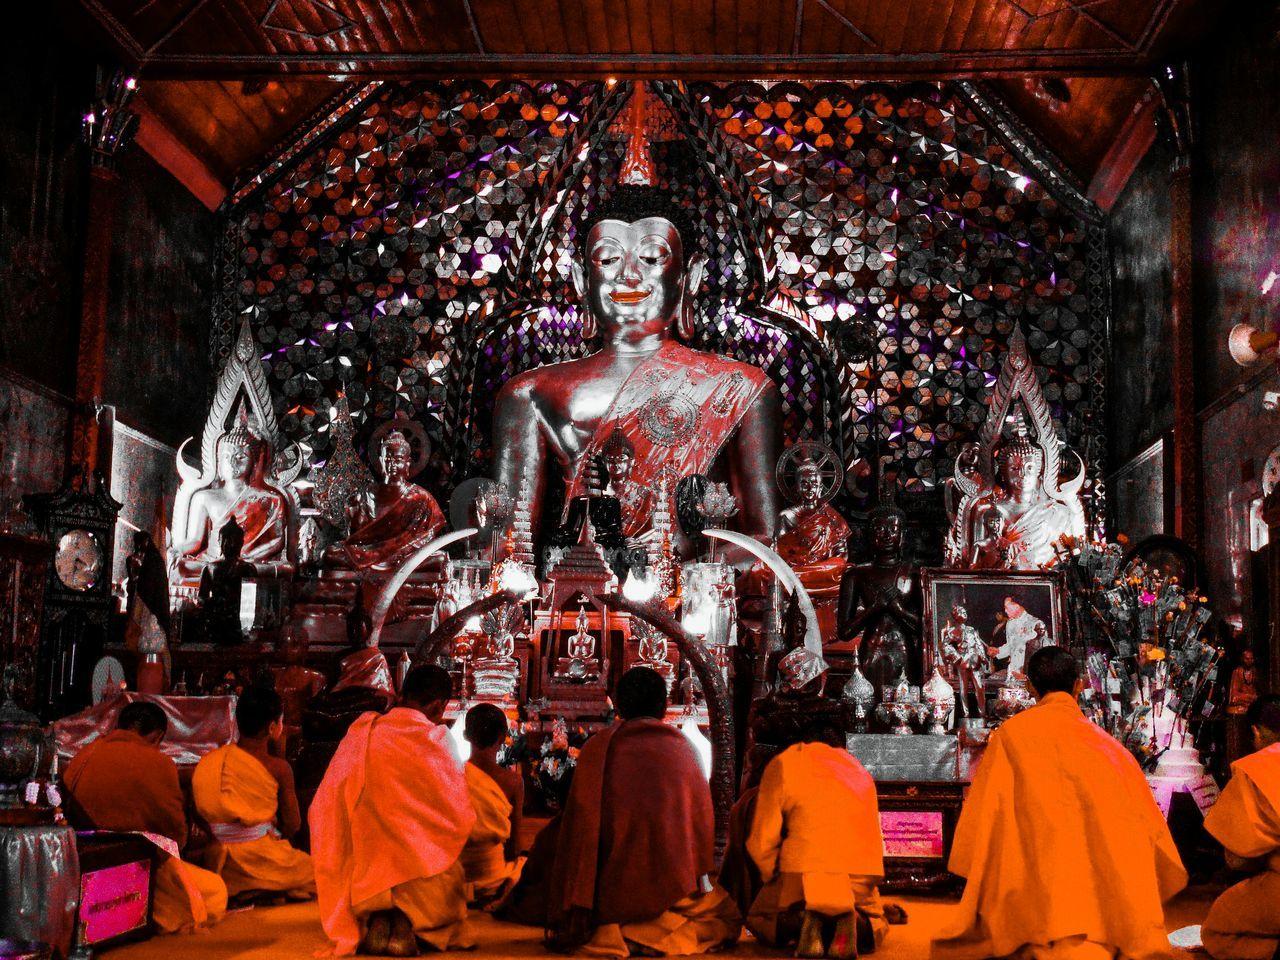 Doi Suthep Doi Suthep Temple Doisuthep Wat Phra That Doi Suthep Watphrathatdoisuthep Chiang Mai Thailand Chiang Mai | Thailand Chiang Mai Temple Temple - Building Temple Architecture Thailand Temple Place Of Worship Spirituality Religious  Orange Carmine Carmine Filter Monks Monk  Praying Prayer Pray Buddha Buddha Statue